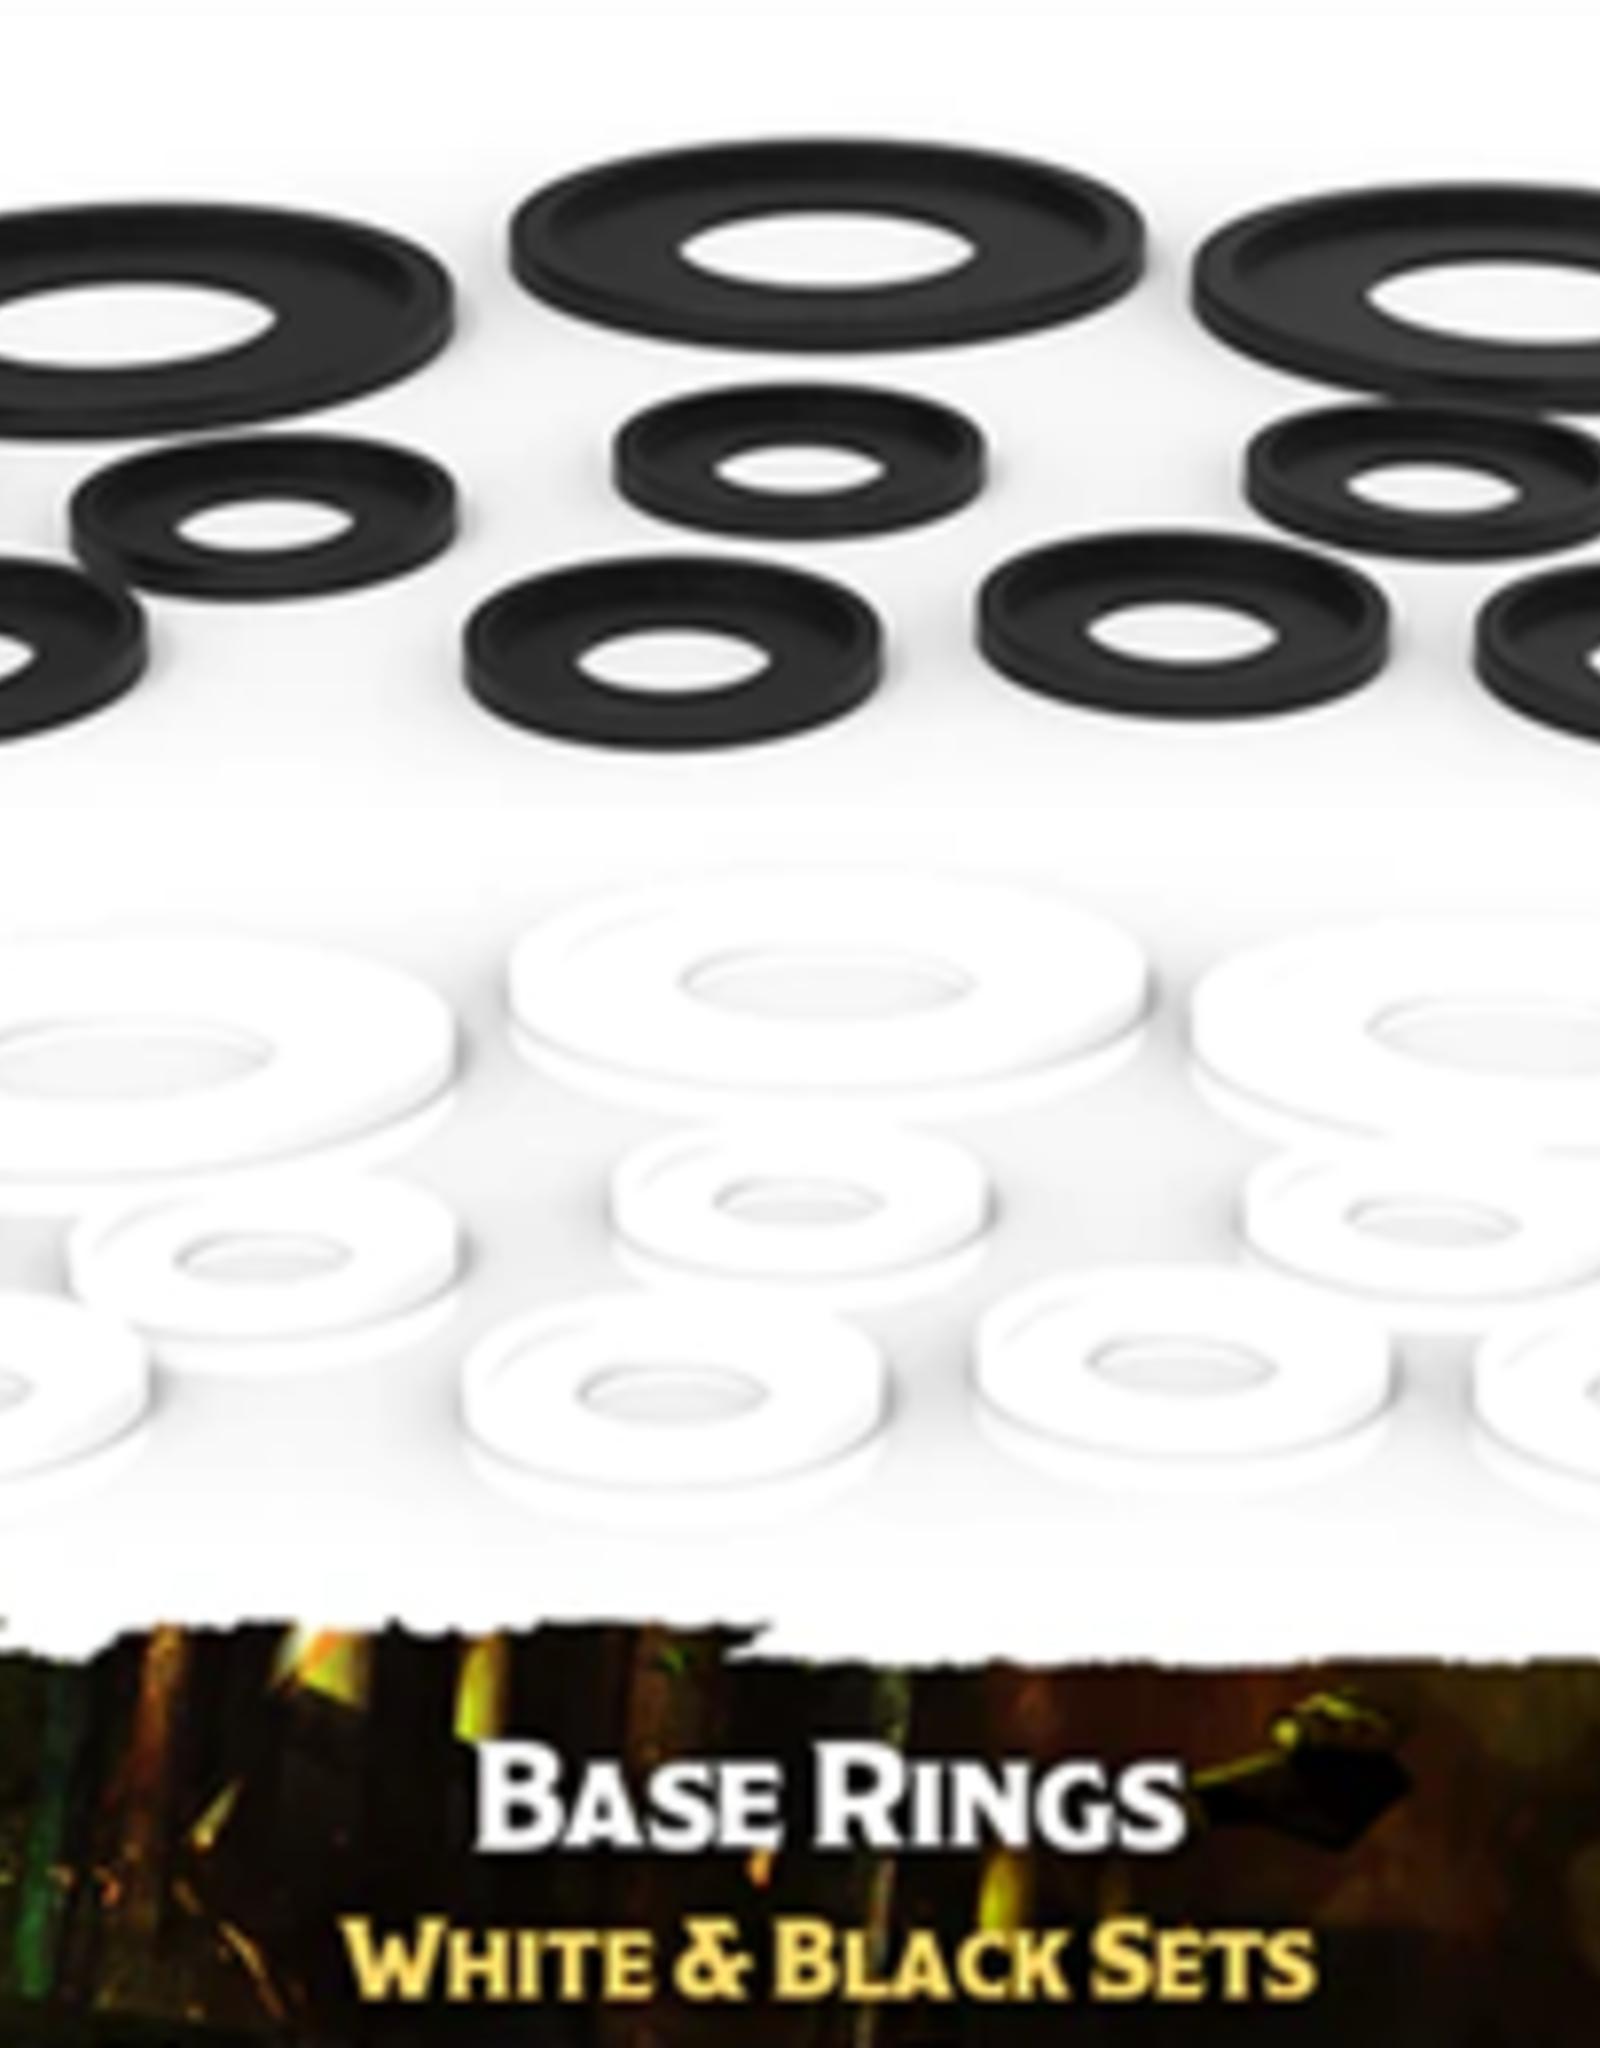 Godtear: Base Rings